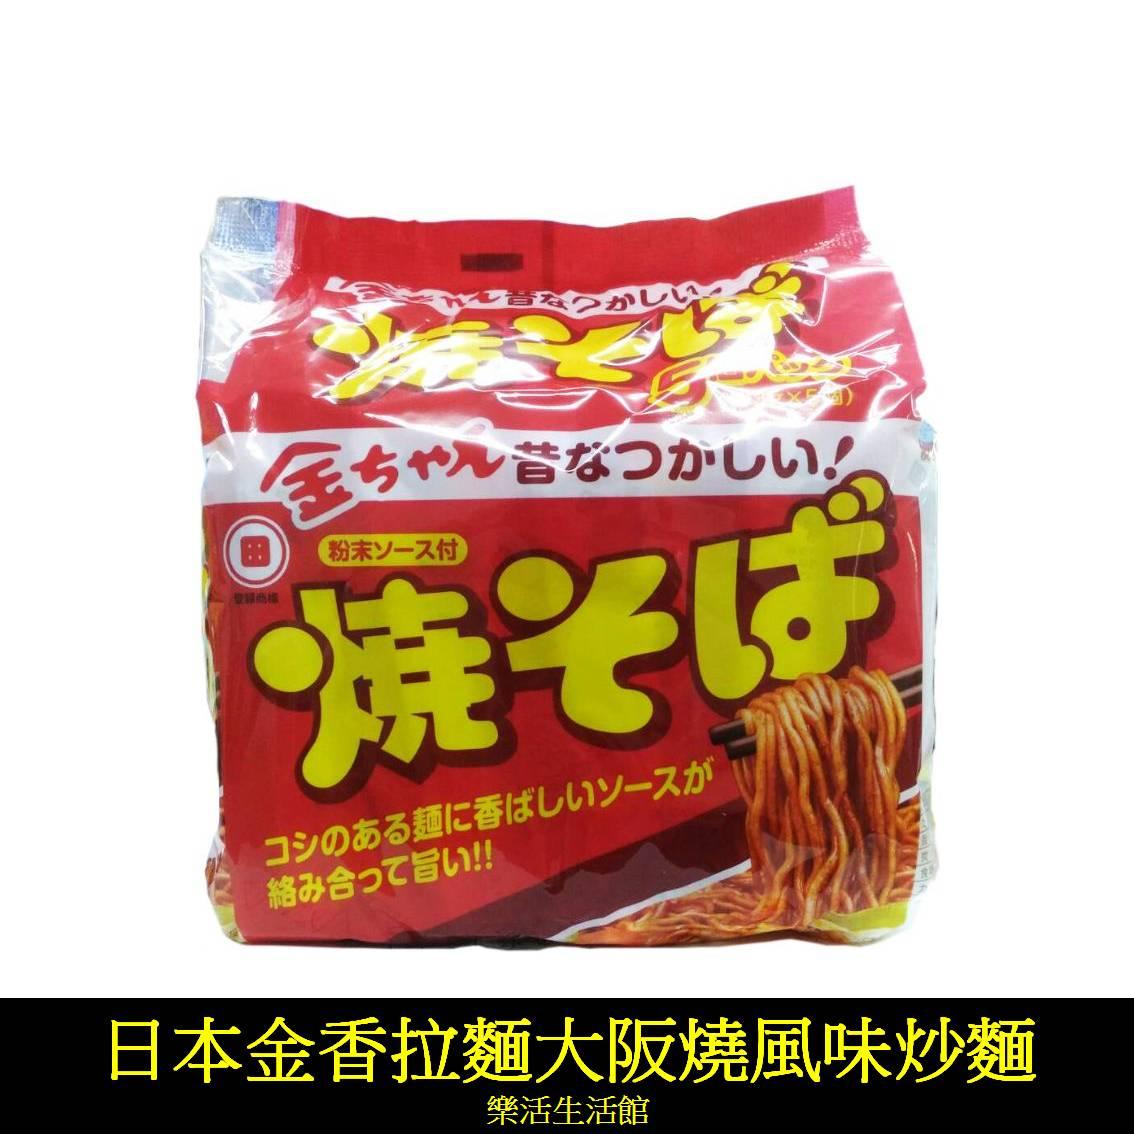 日本 金香拉麵 (金ちゃん)大阪燒風味炒麵 * 1 包 【樂活生活館】